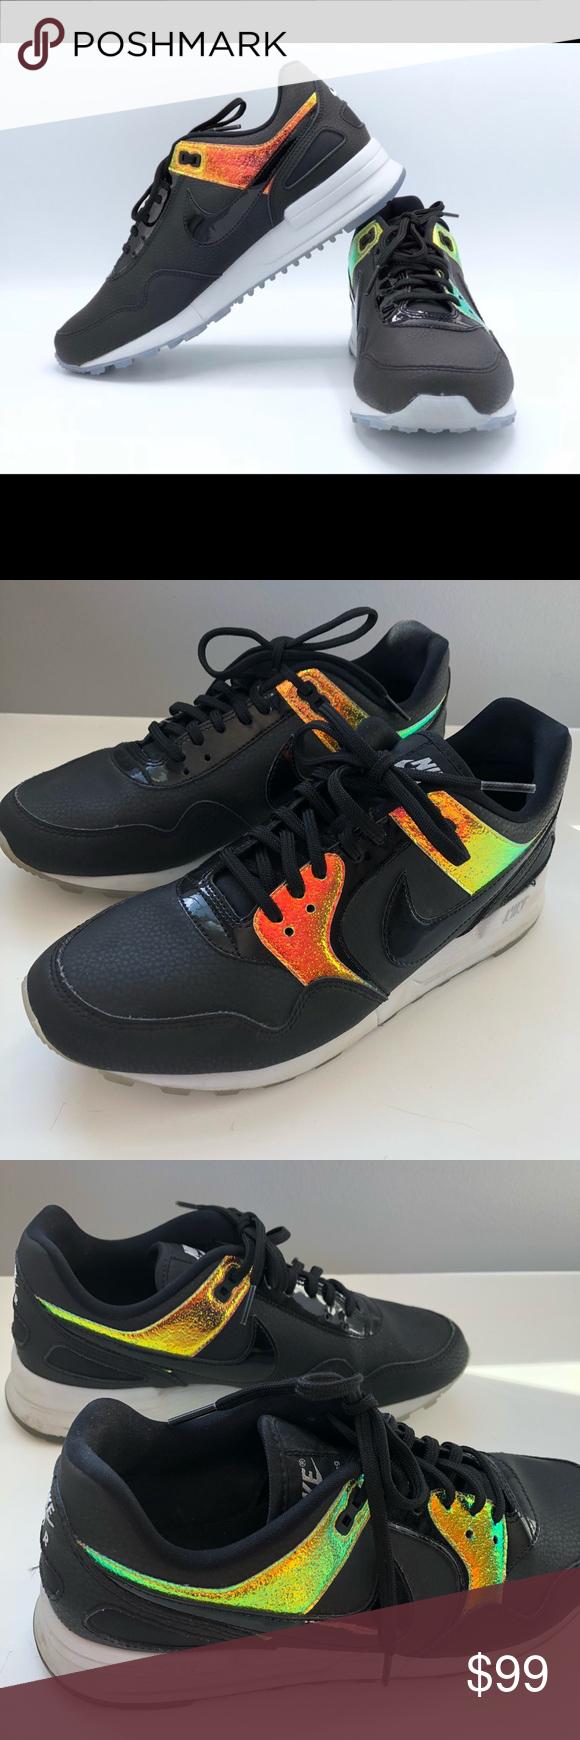 c98c372c23d29 Nike Air Pegasus 89 Sneaker Size 9 Nike Air Pegasus 89 Prm Womens Style    844889-002 Size  9 Color  BLACK BLACK-BLUE TINT-PURE PLATINUM Black Sneaker  With ...